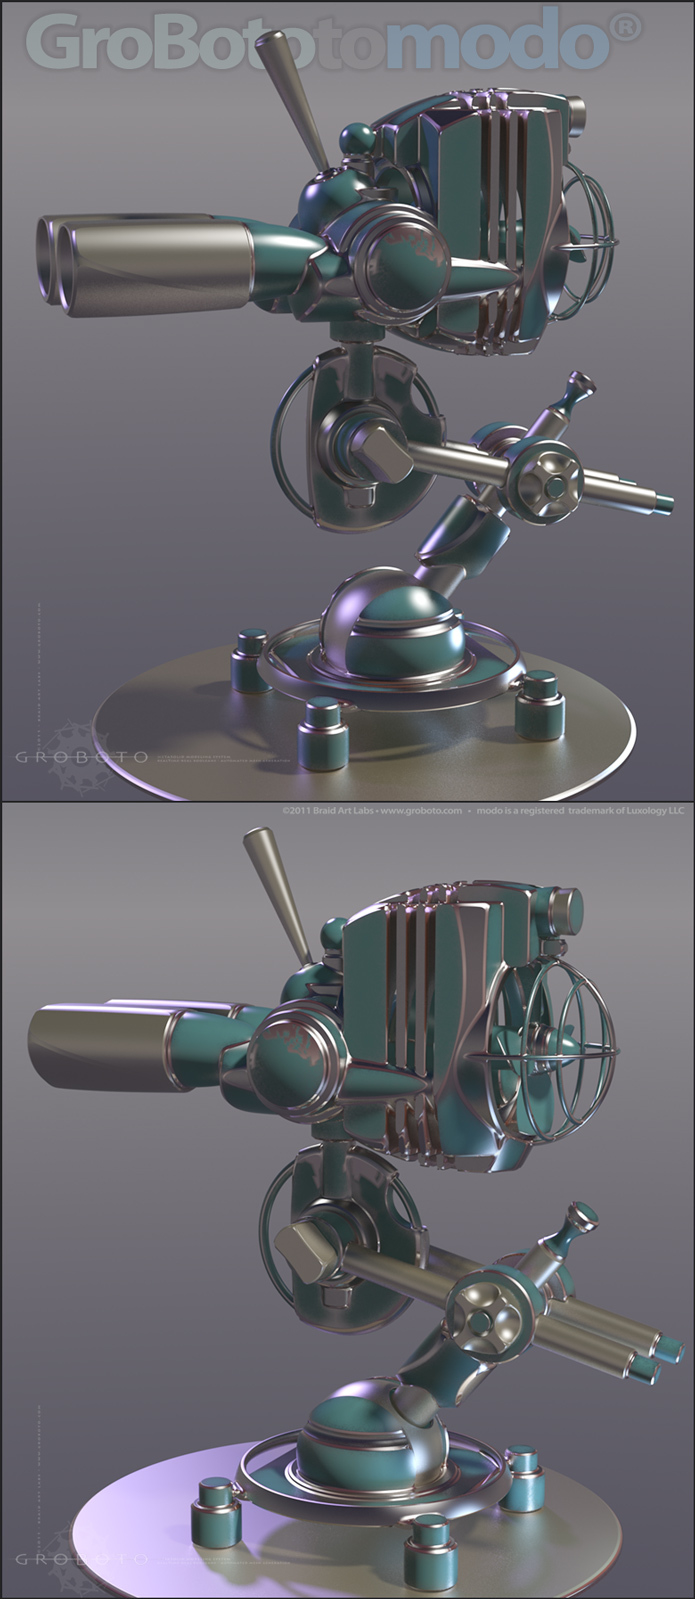 Groboto binojector test rend 1 a40349d0 2gi6